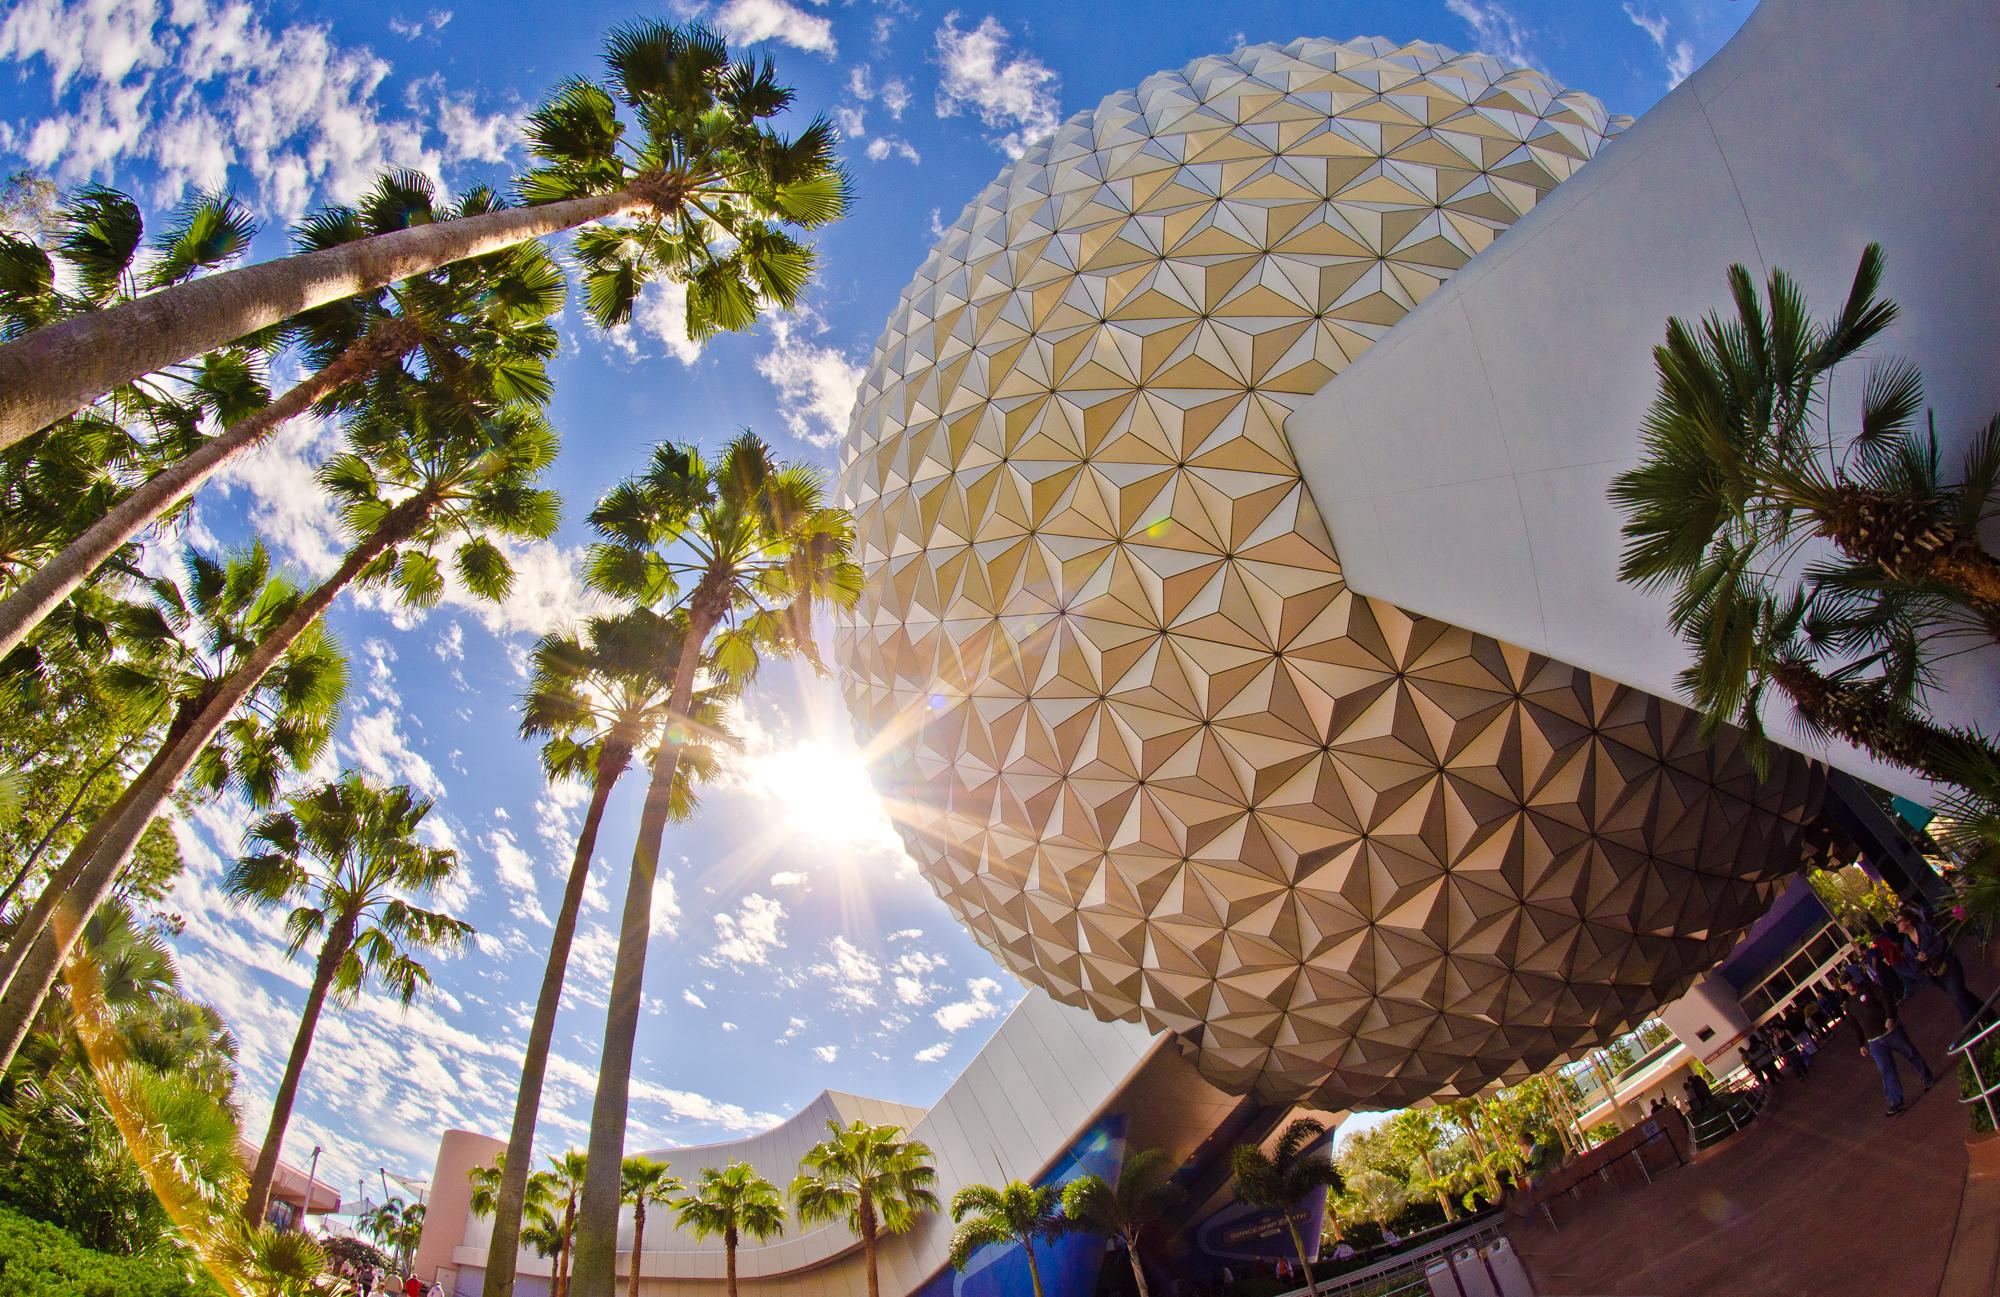 Epcot's Spaceship Earth Sunshine